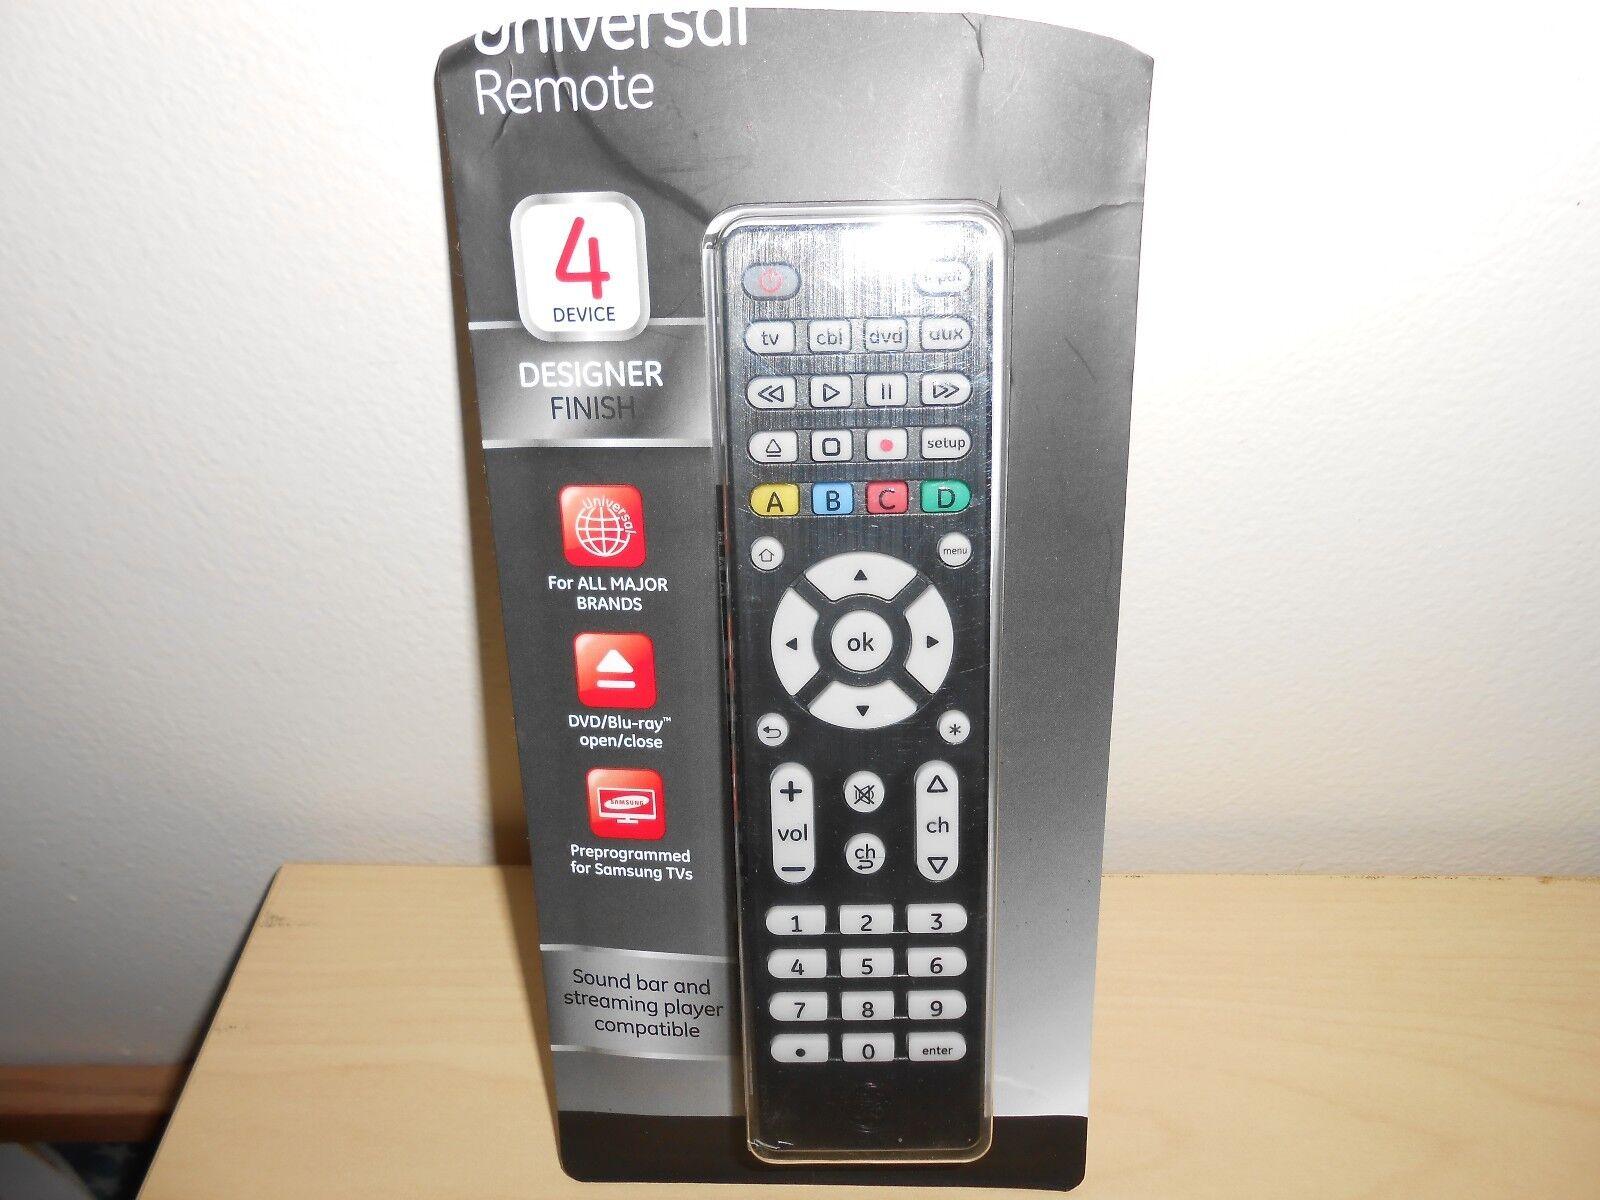 GE 34457 4-Device Universal Remote Control, Designer Series